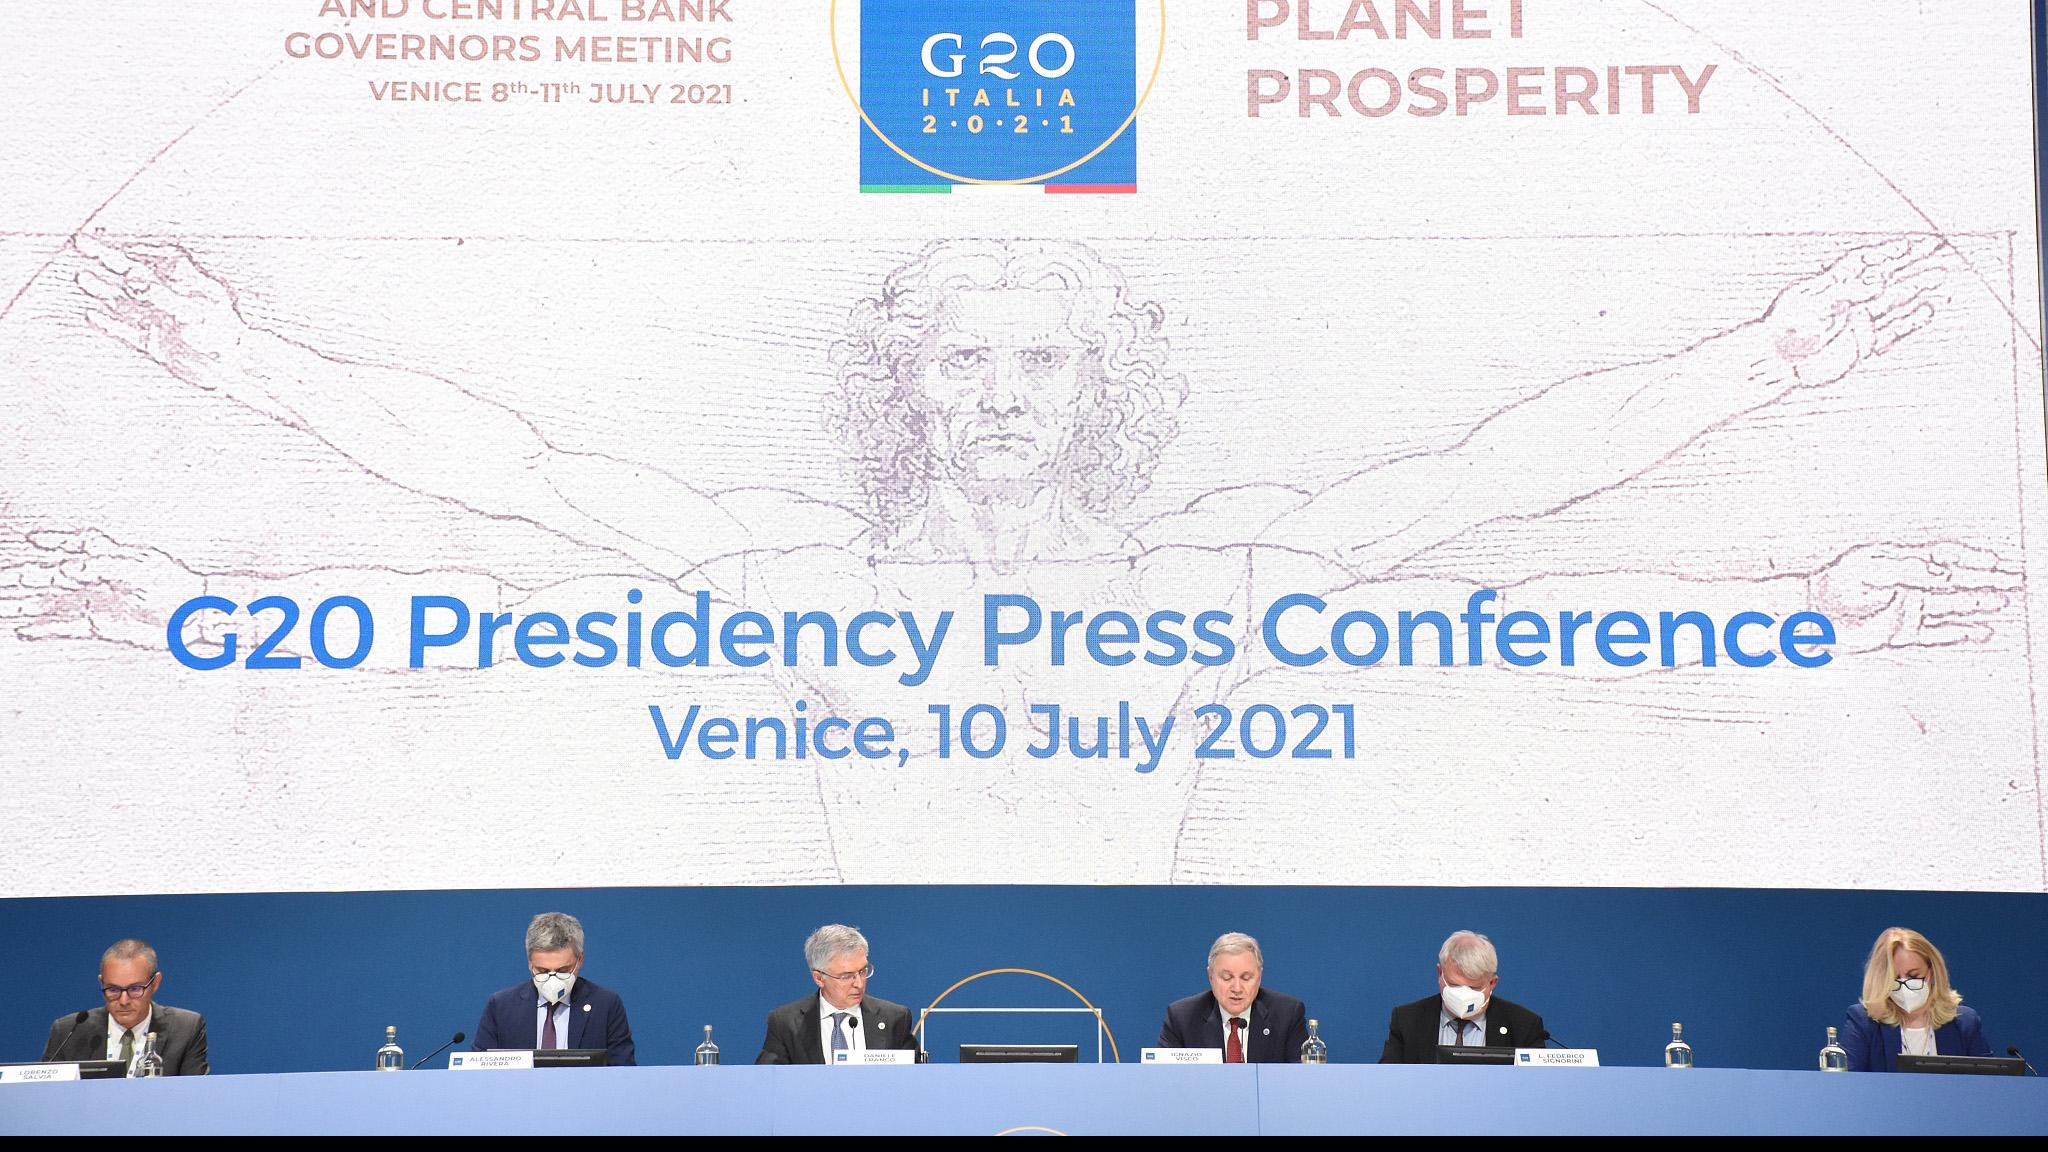 G20 leaders seek agreement on 15% global corporate tax rate - CGTN